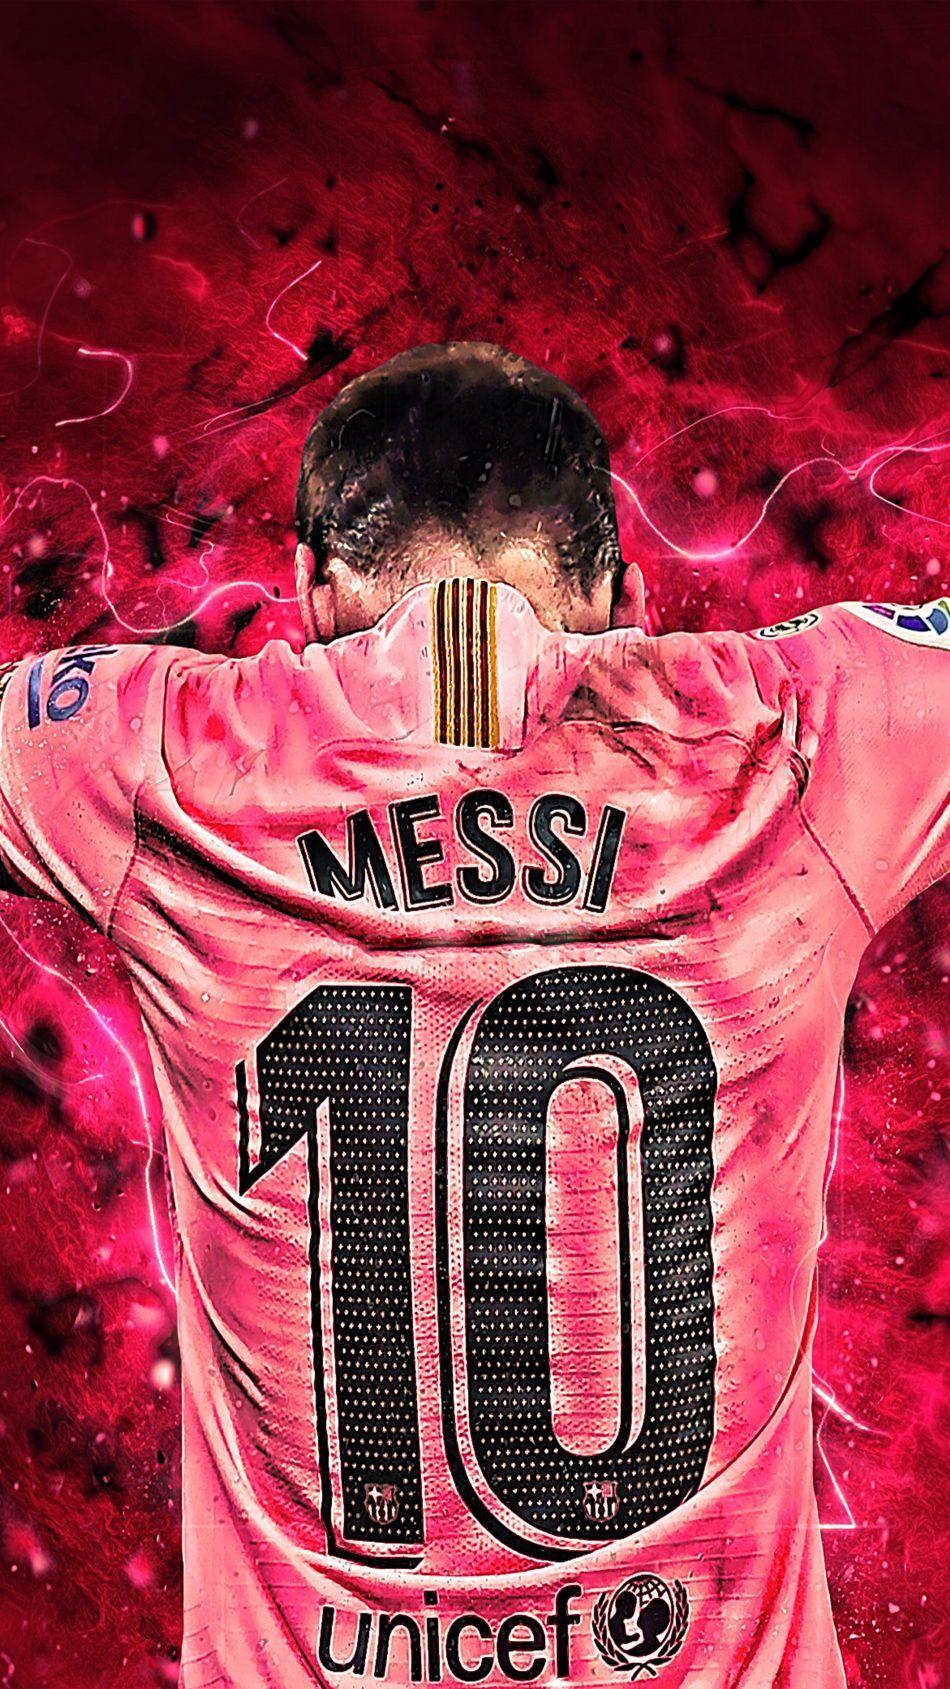 Messi 10 Art Graphics 4k Ultra Hd Mobile Wallpaper Lionel Messi Wallpapers Messi Messi Soccer